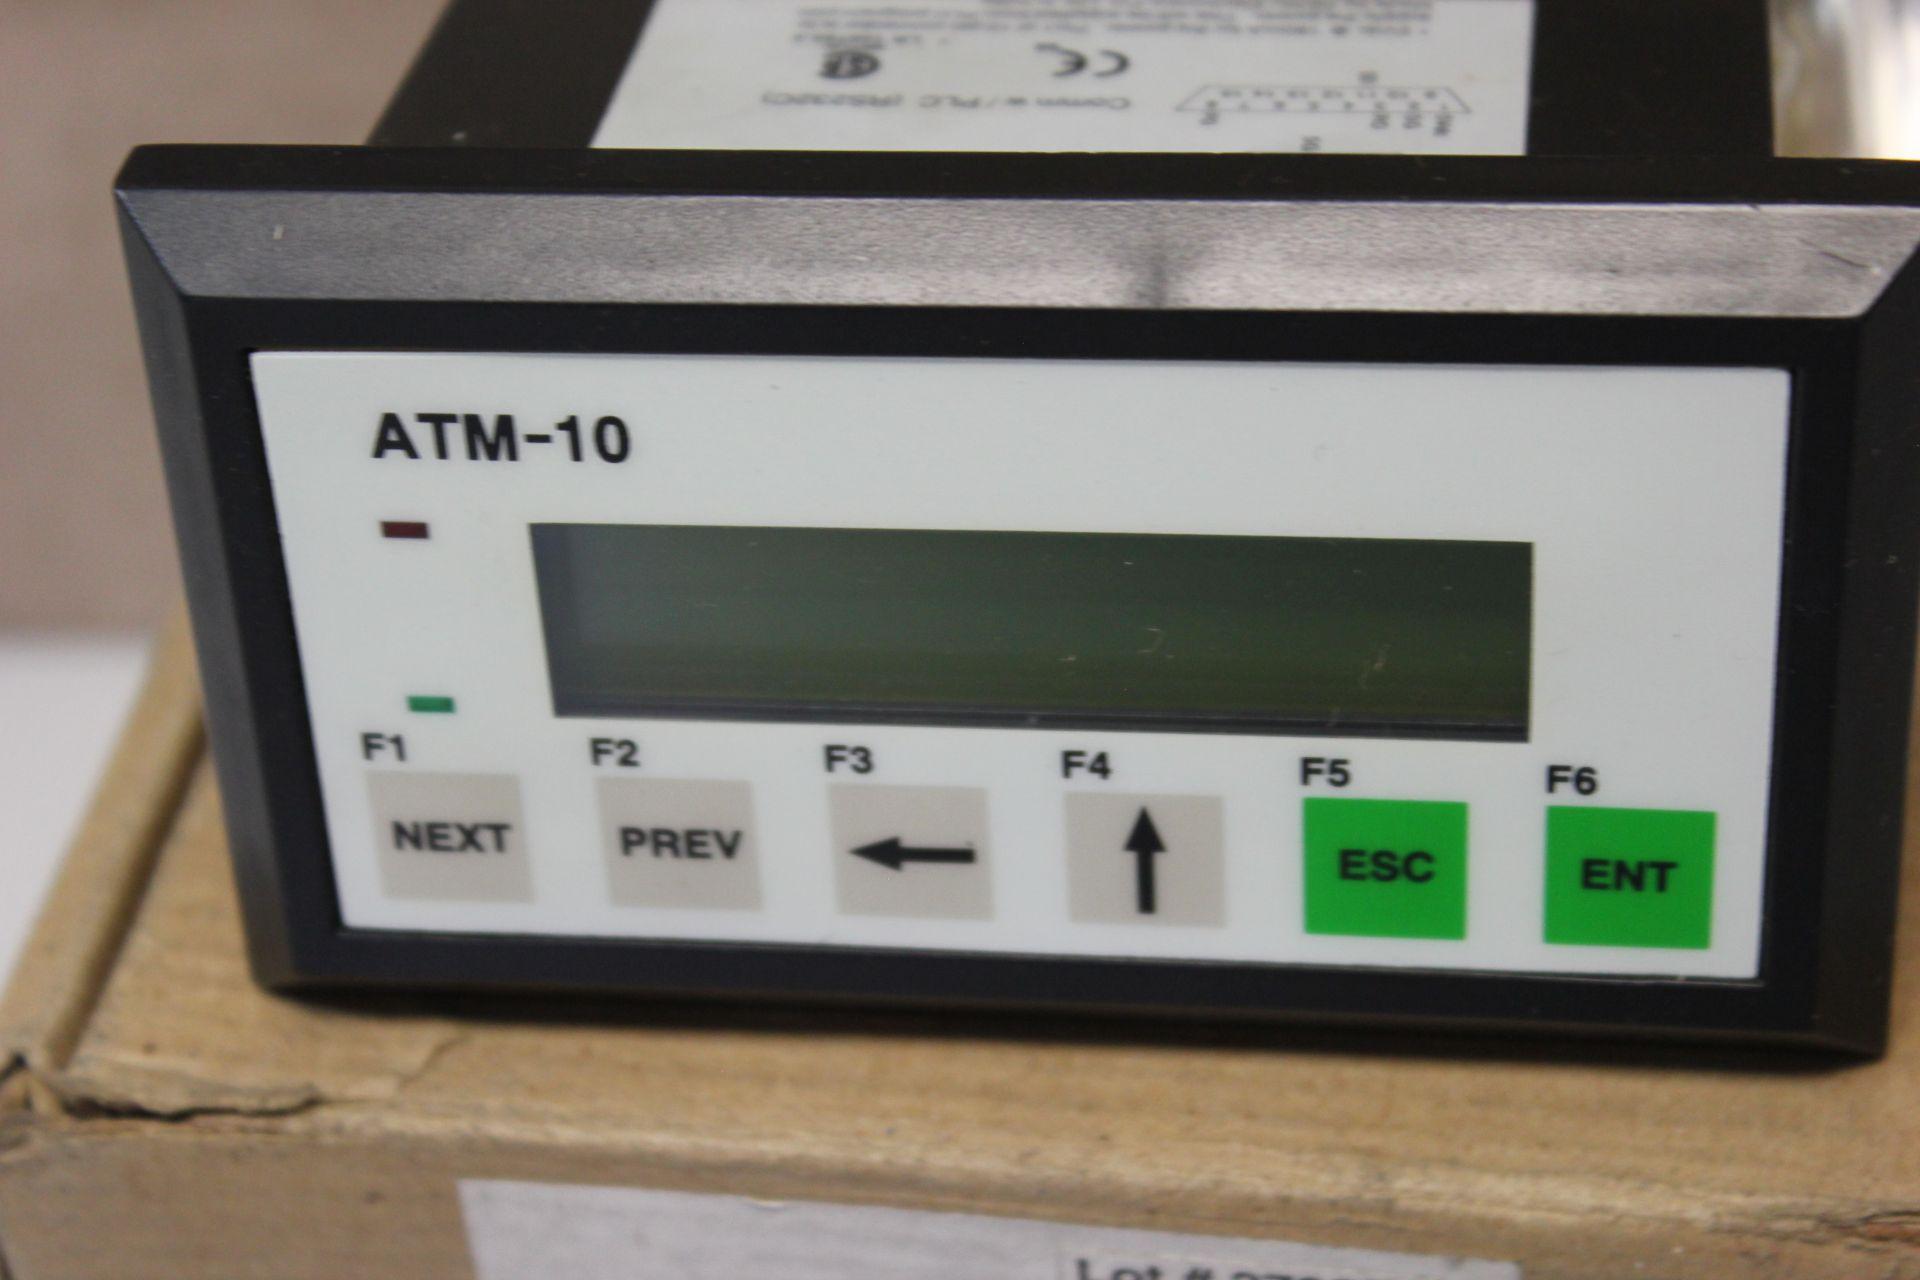 NEW AROMAT HMI INTERFACE PANEL - Image 2 of 3